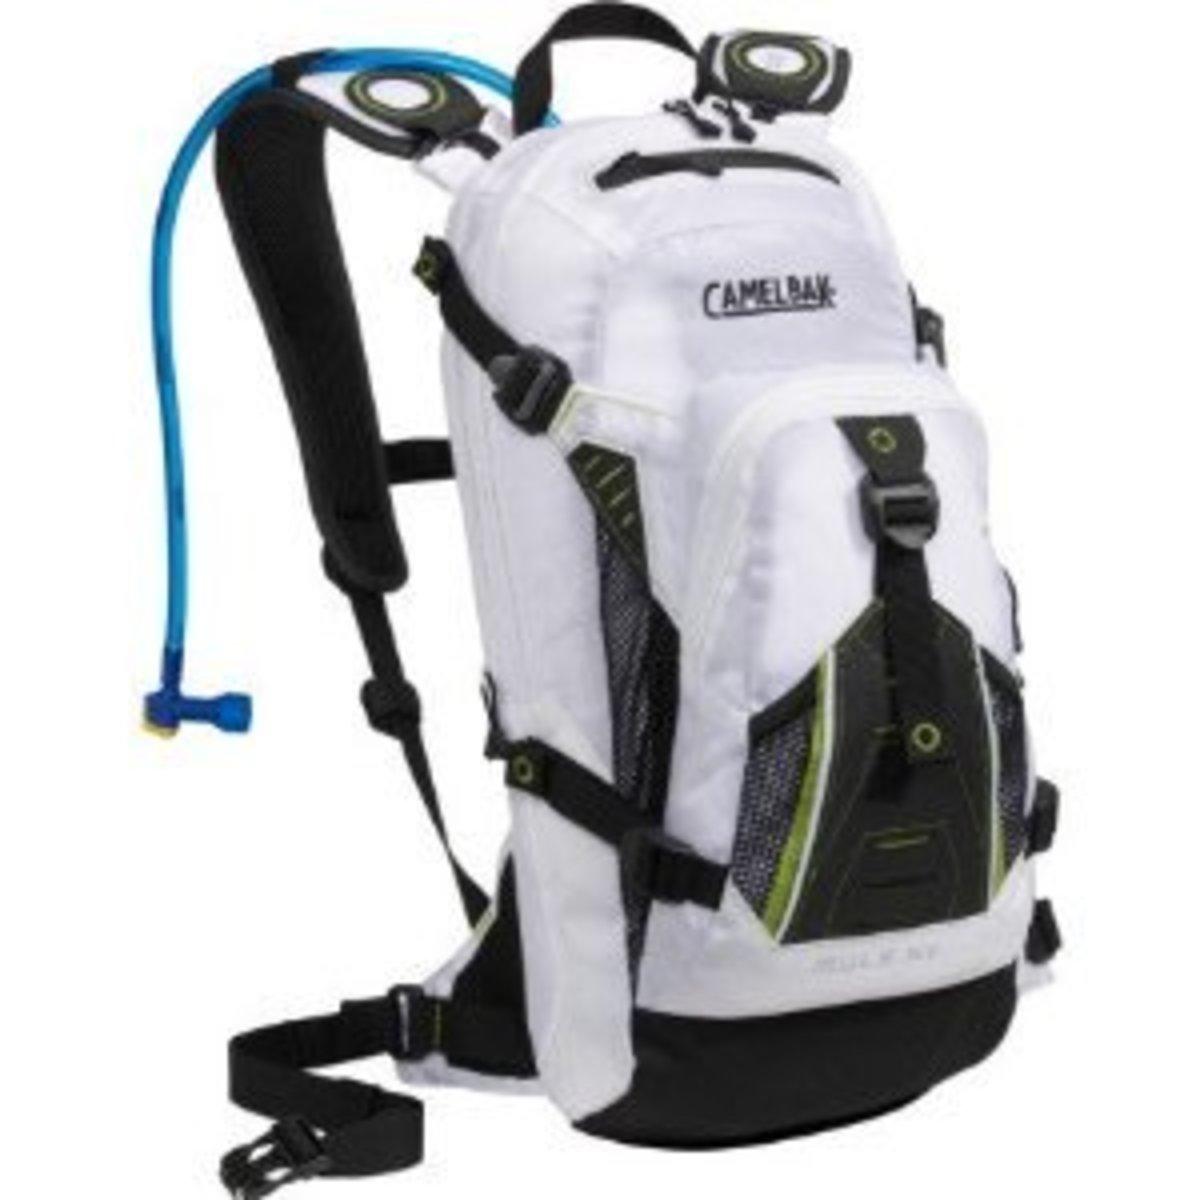 Camelbak M.U.L.E. NV 100 Oz Hydration Pack - White